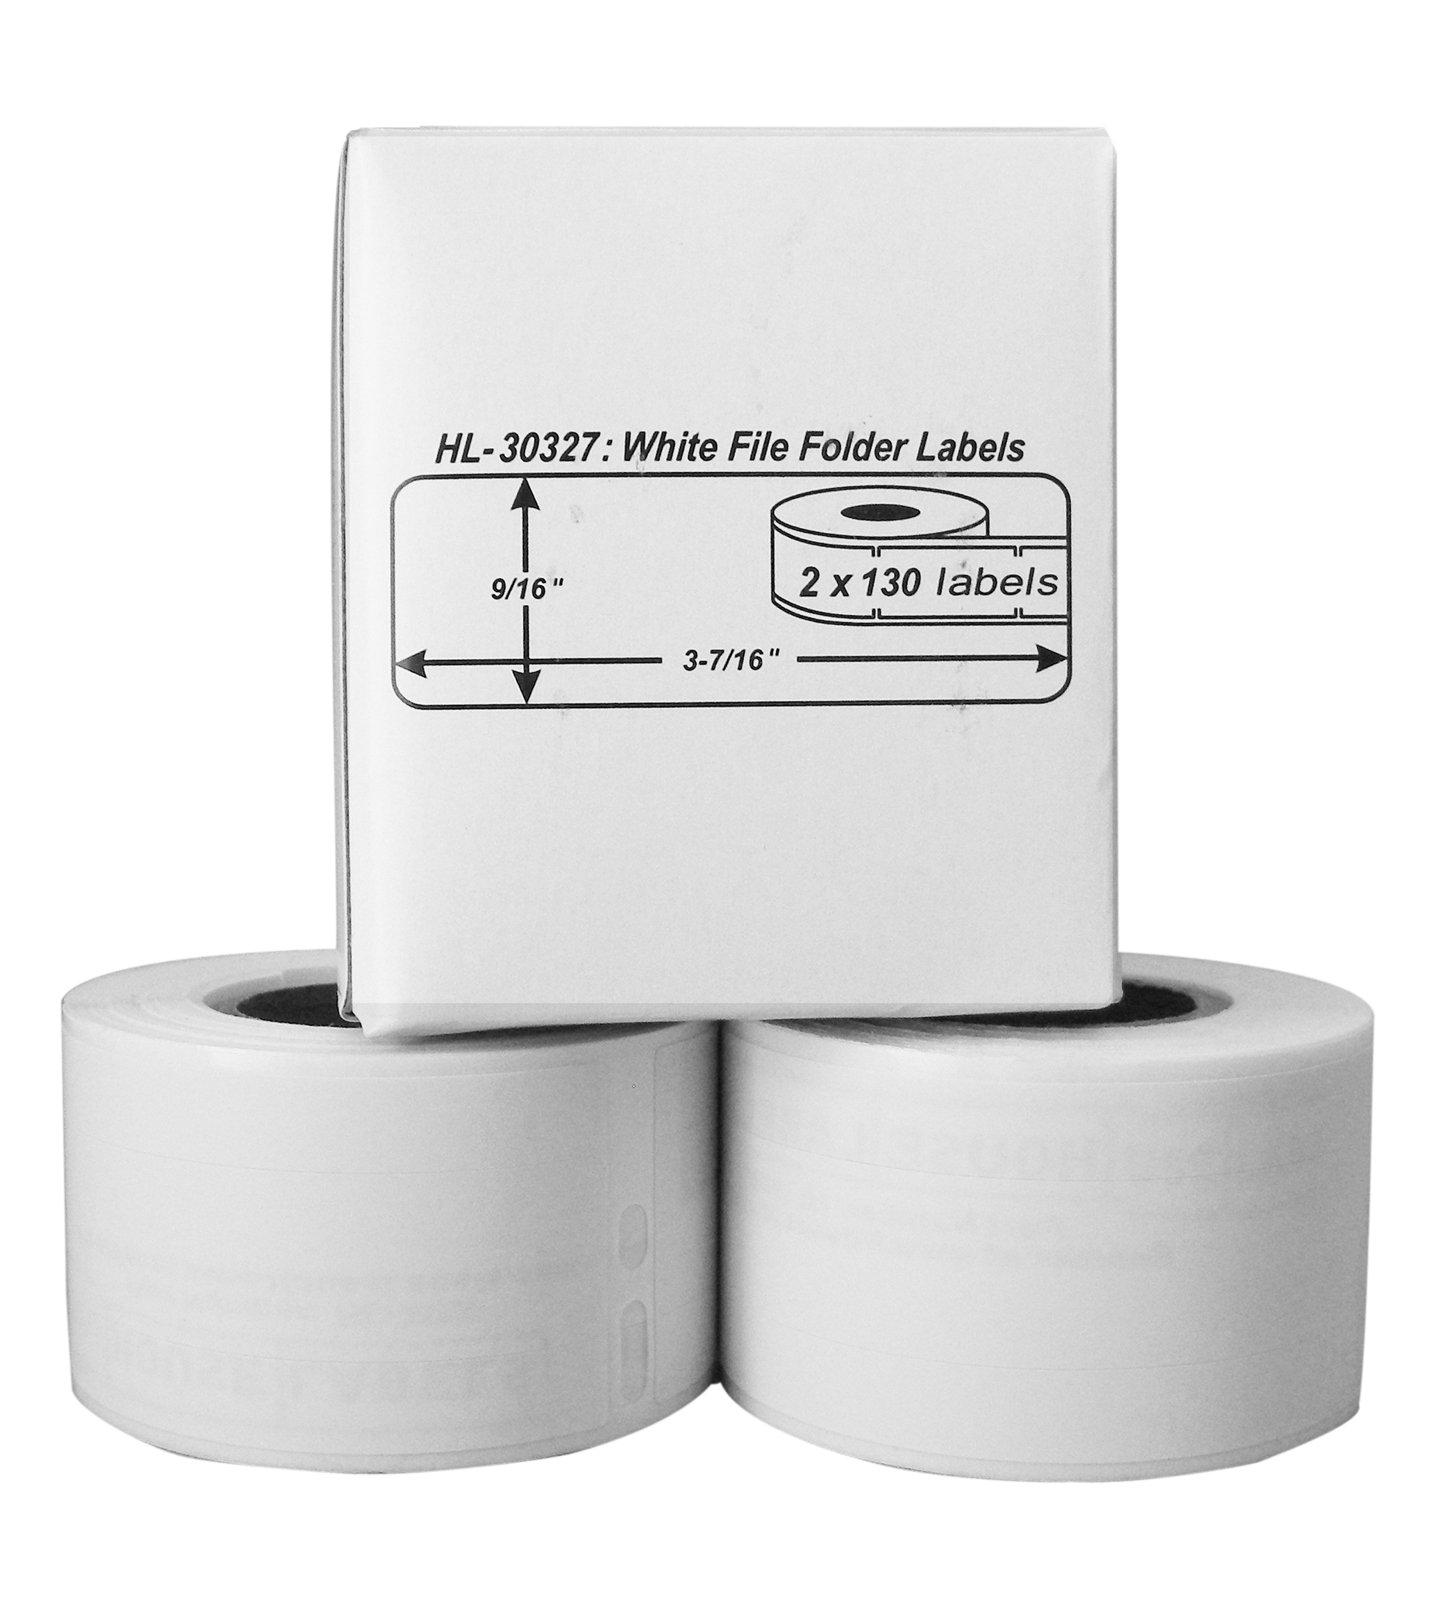 56 Rolls; 130 Labels per Roll of DYMO-Compatible 30327, 30576 File Folder Labels (9/16'' x 3-7/16'') -- BPA Free!